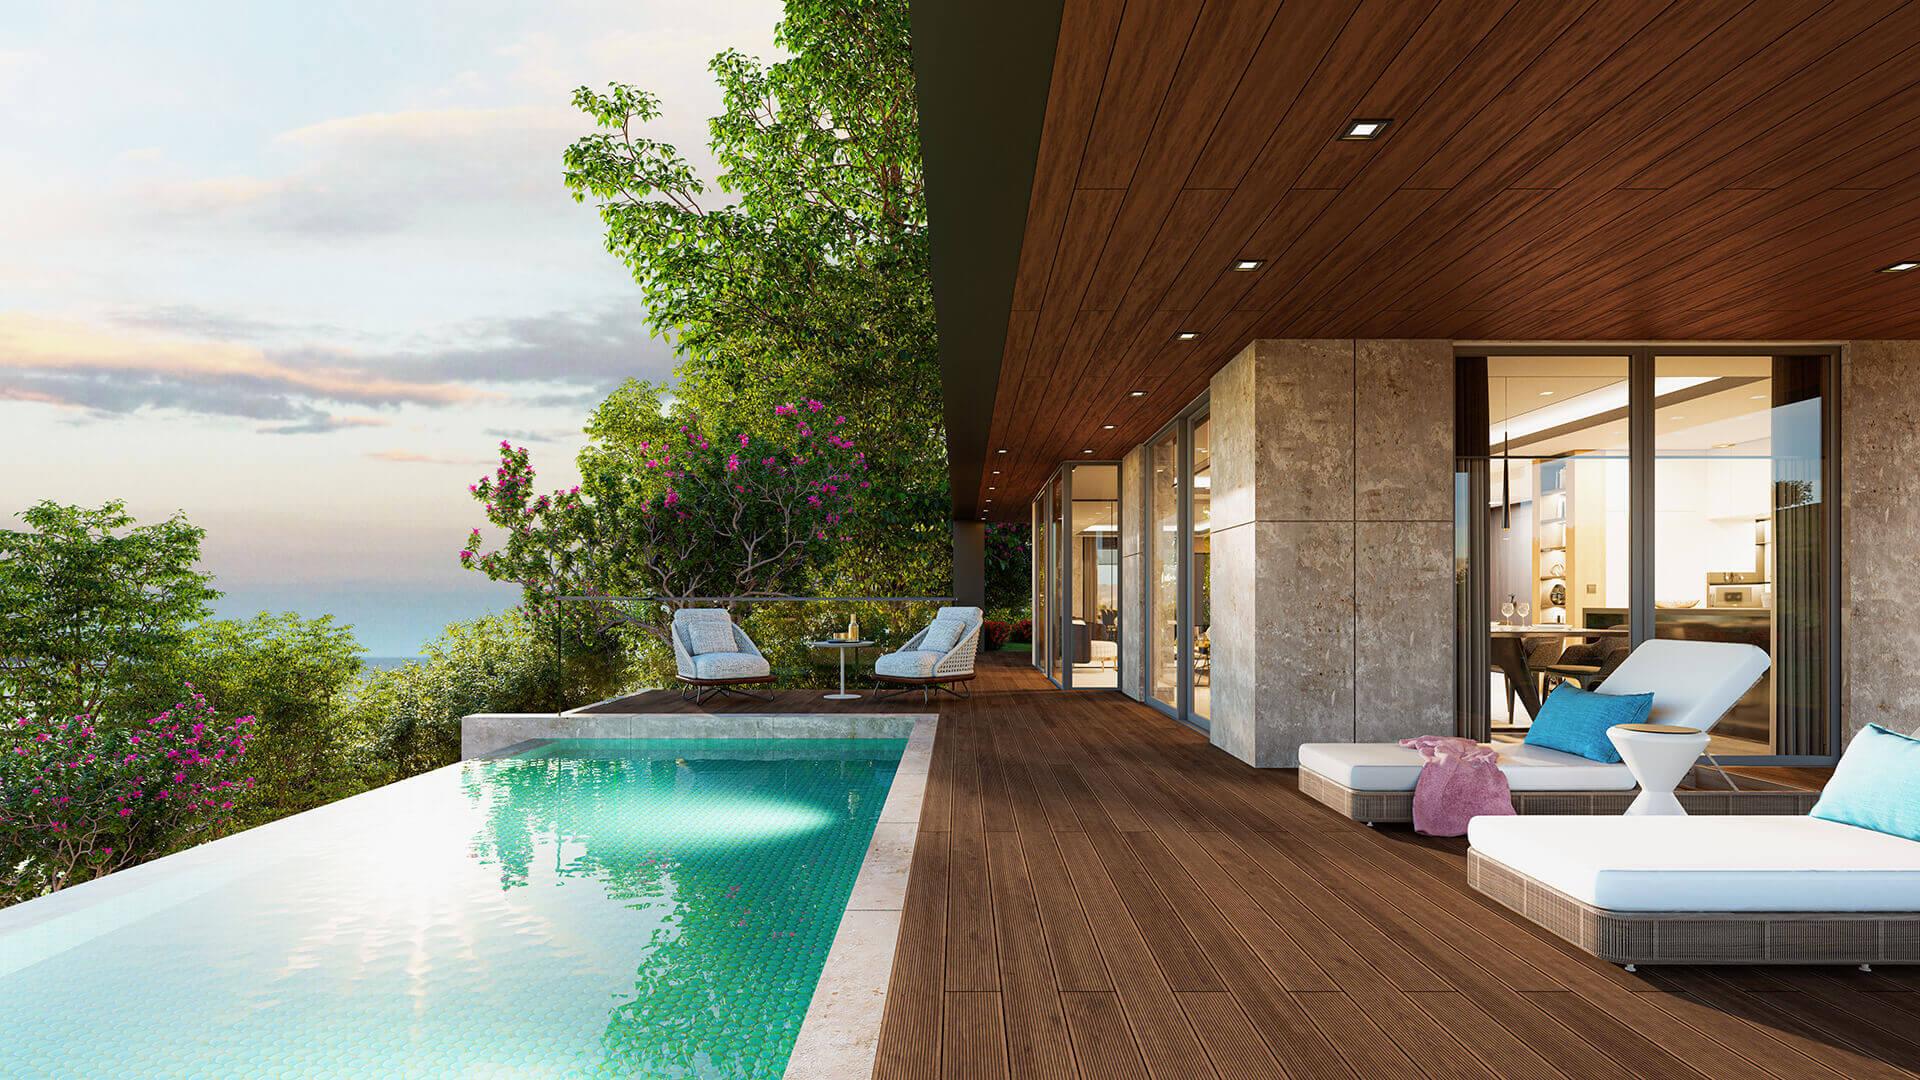 Buteo-Exclusive-Villas-Pool-Havuz.jpg